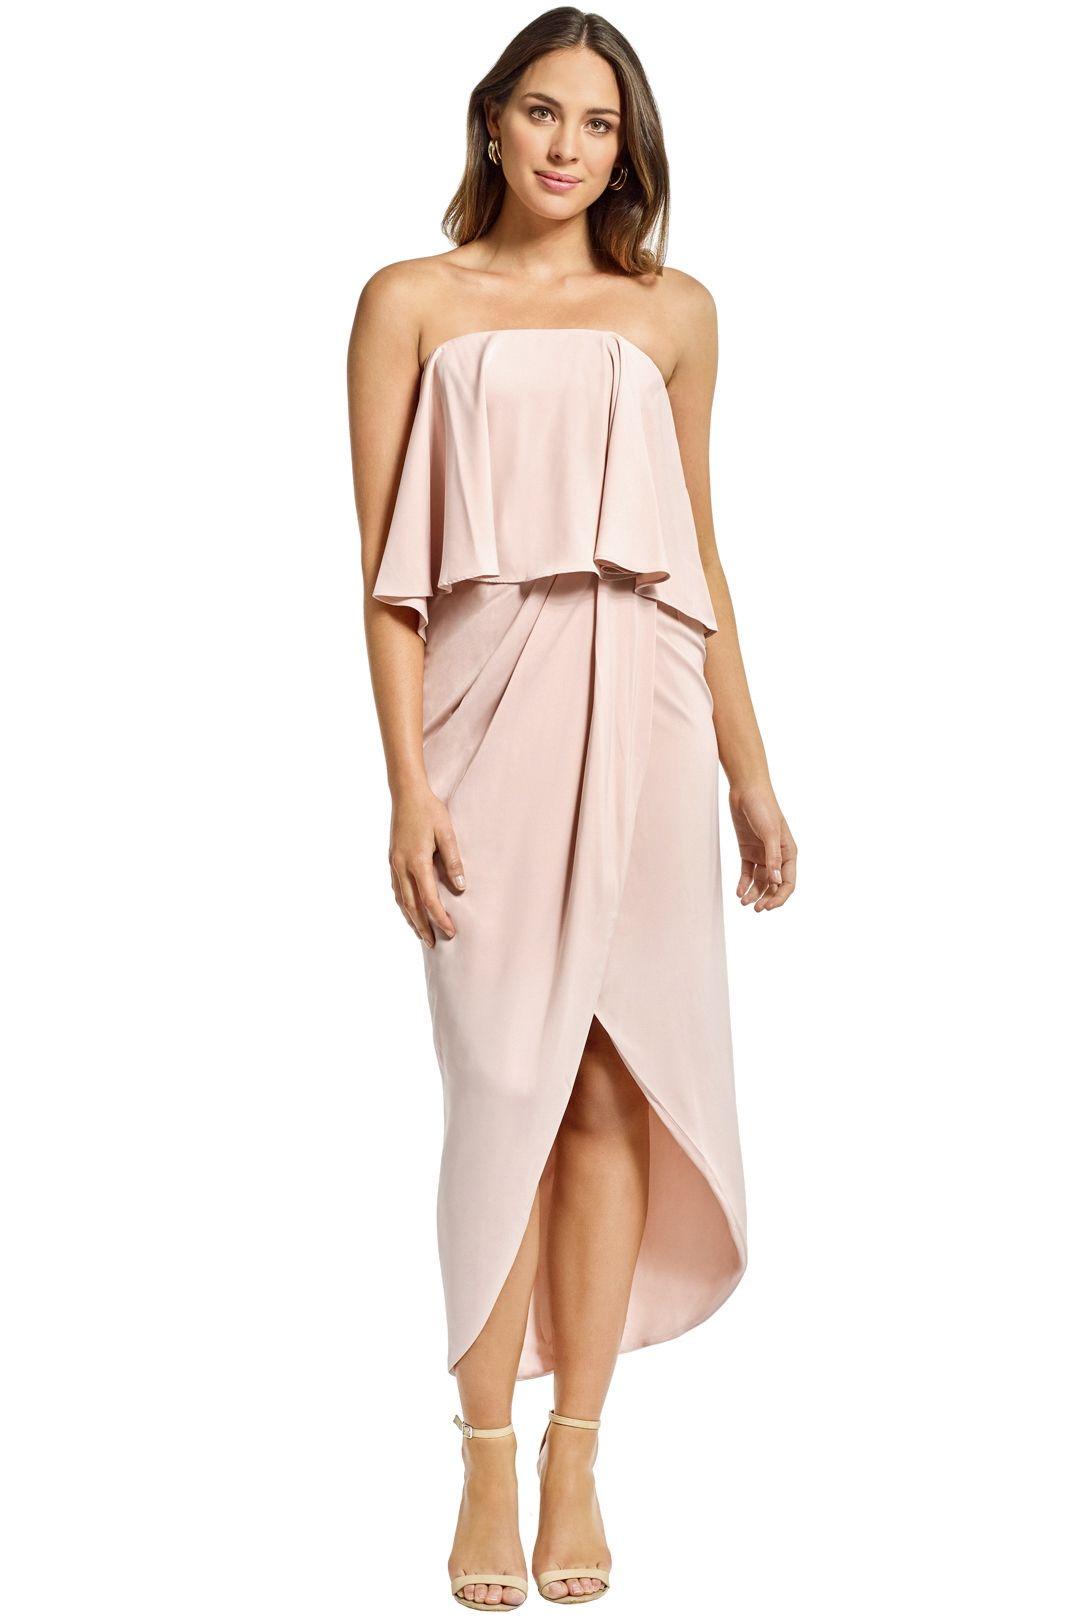 Shona Joy - Strapless Frill Drape Maxi Dress - Ballet - Front